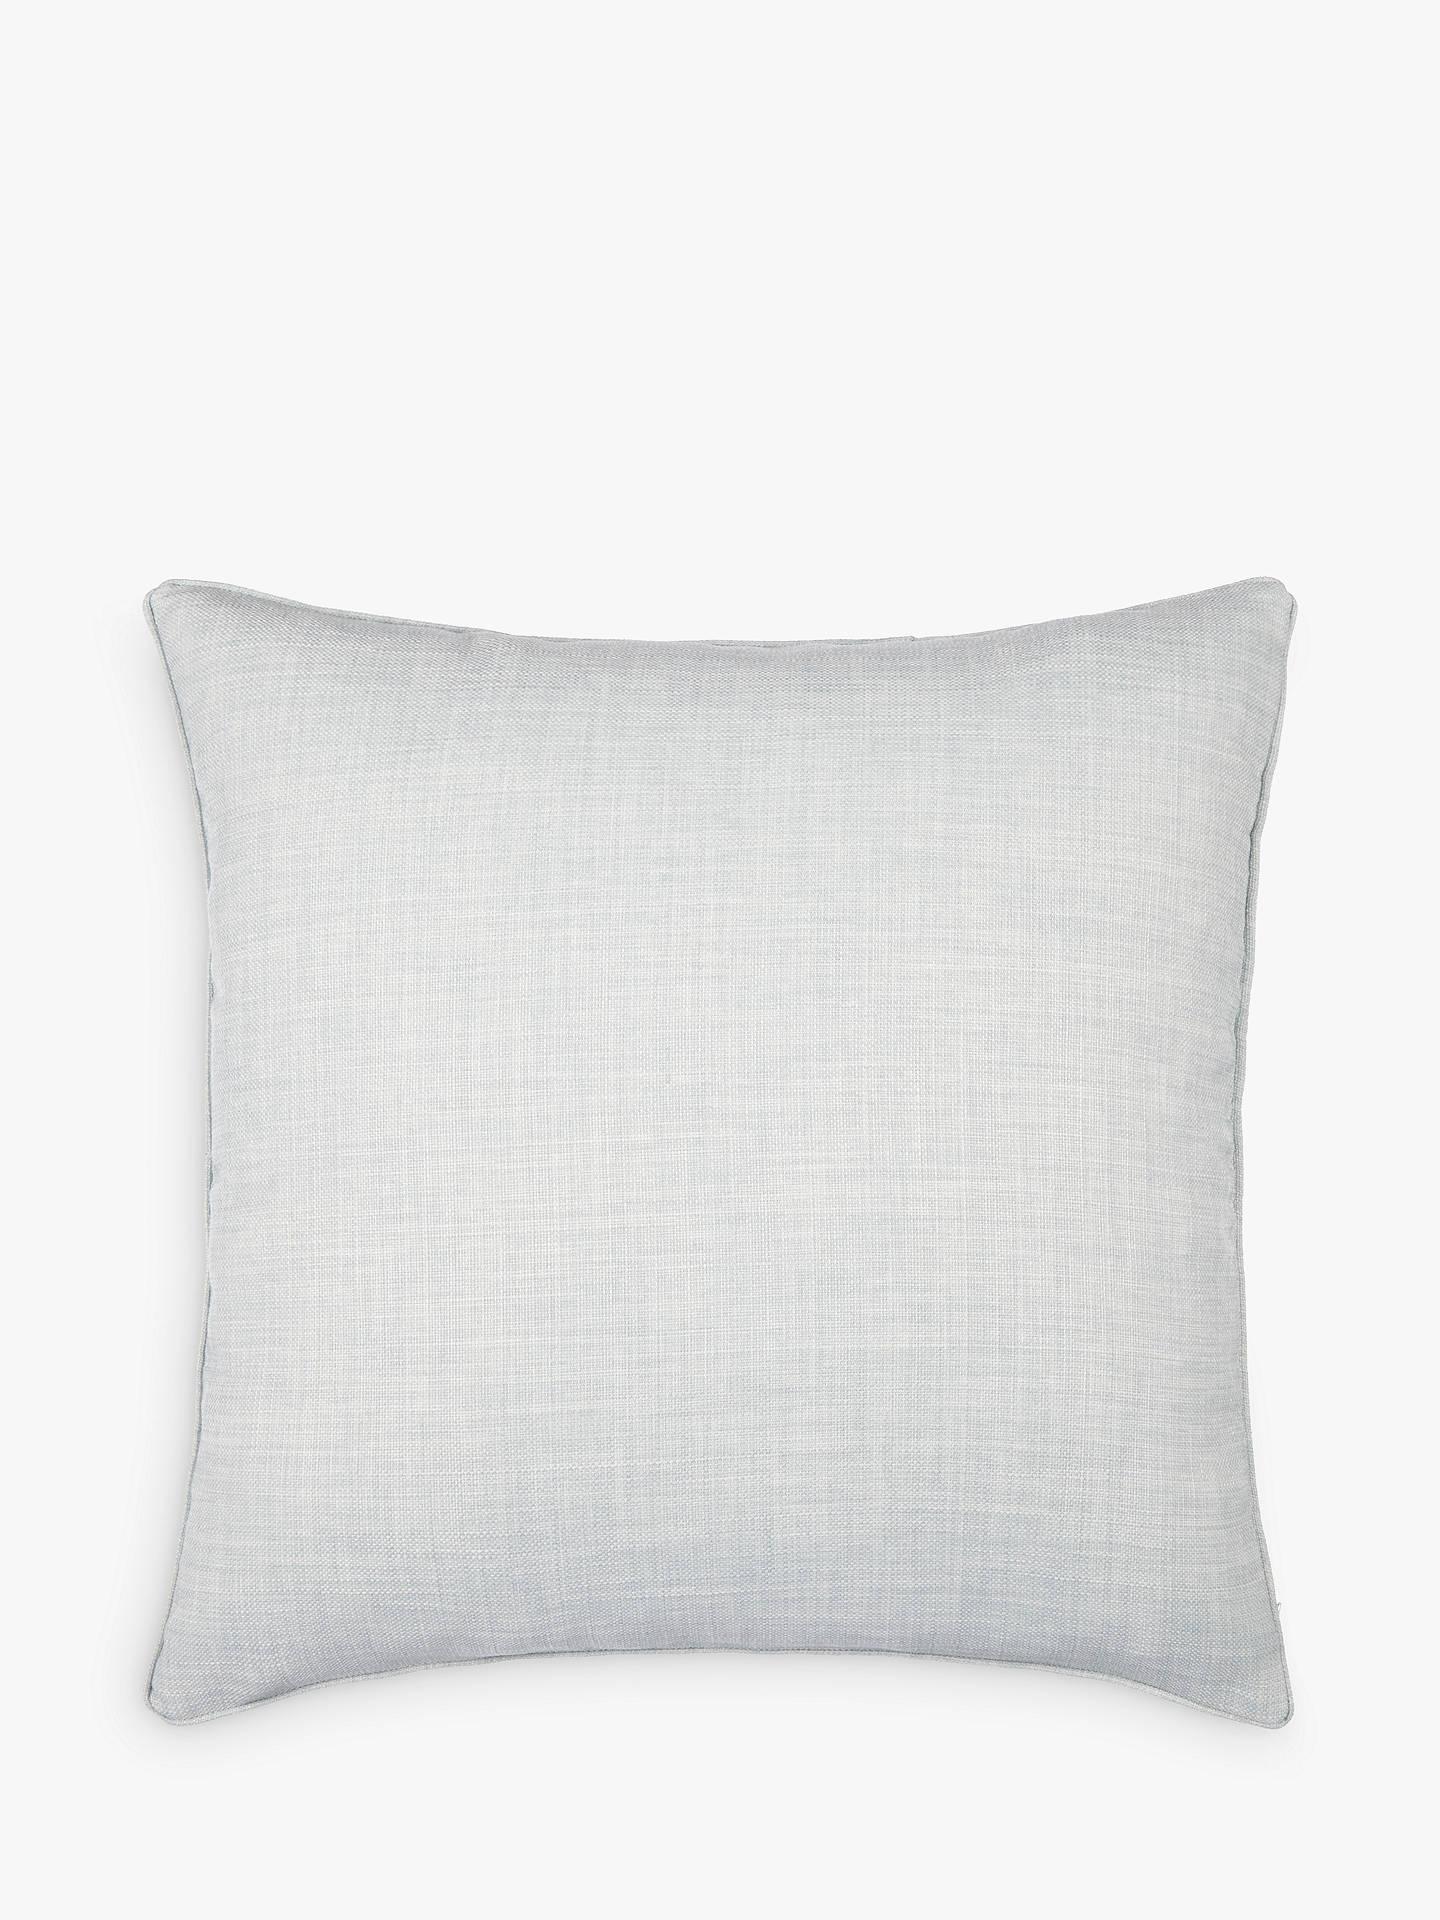 john lewis partners barathea cushion at john lewis. Black Bedroom Furniture Sets. Home Design Ideas